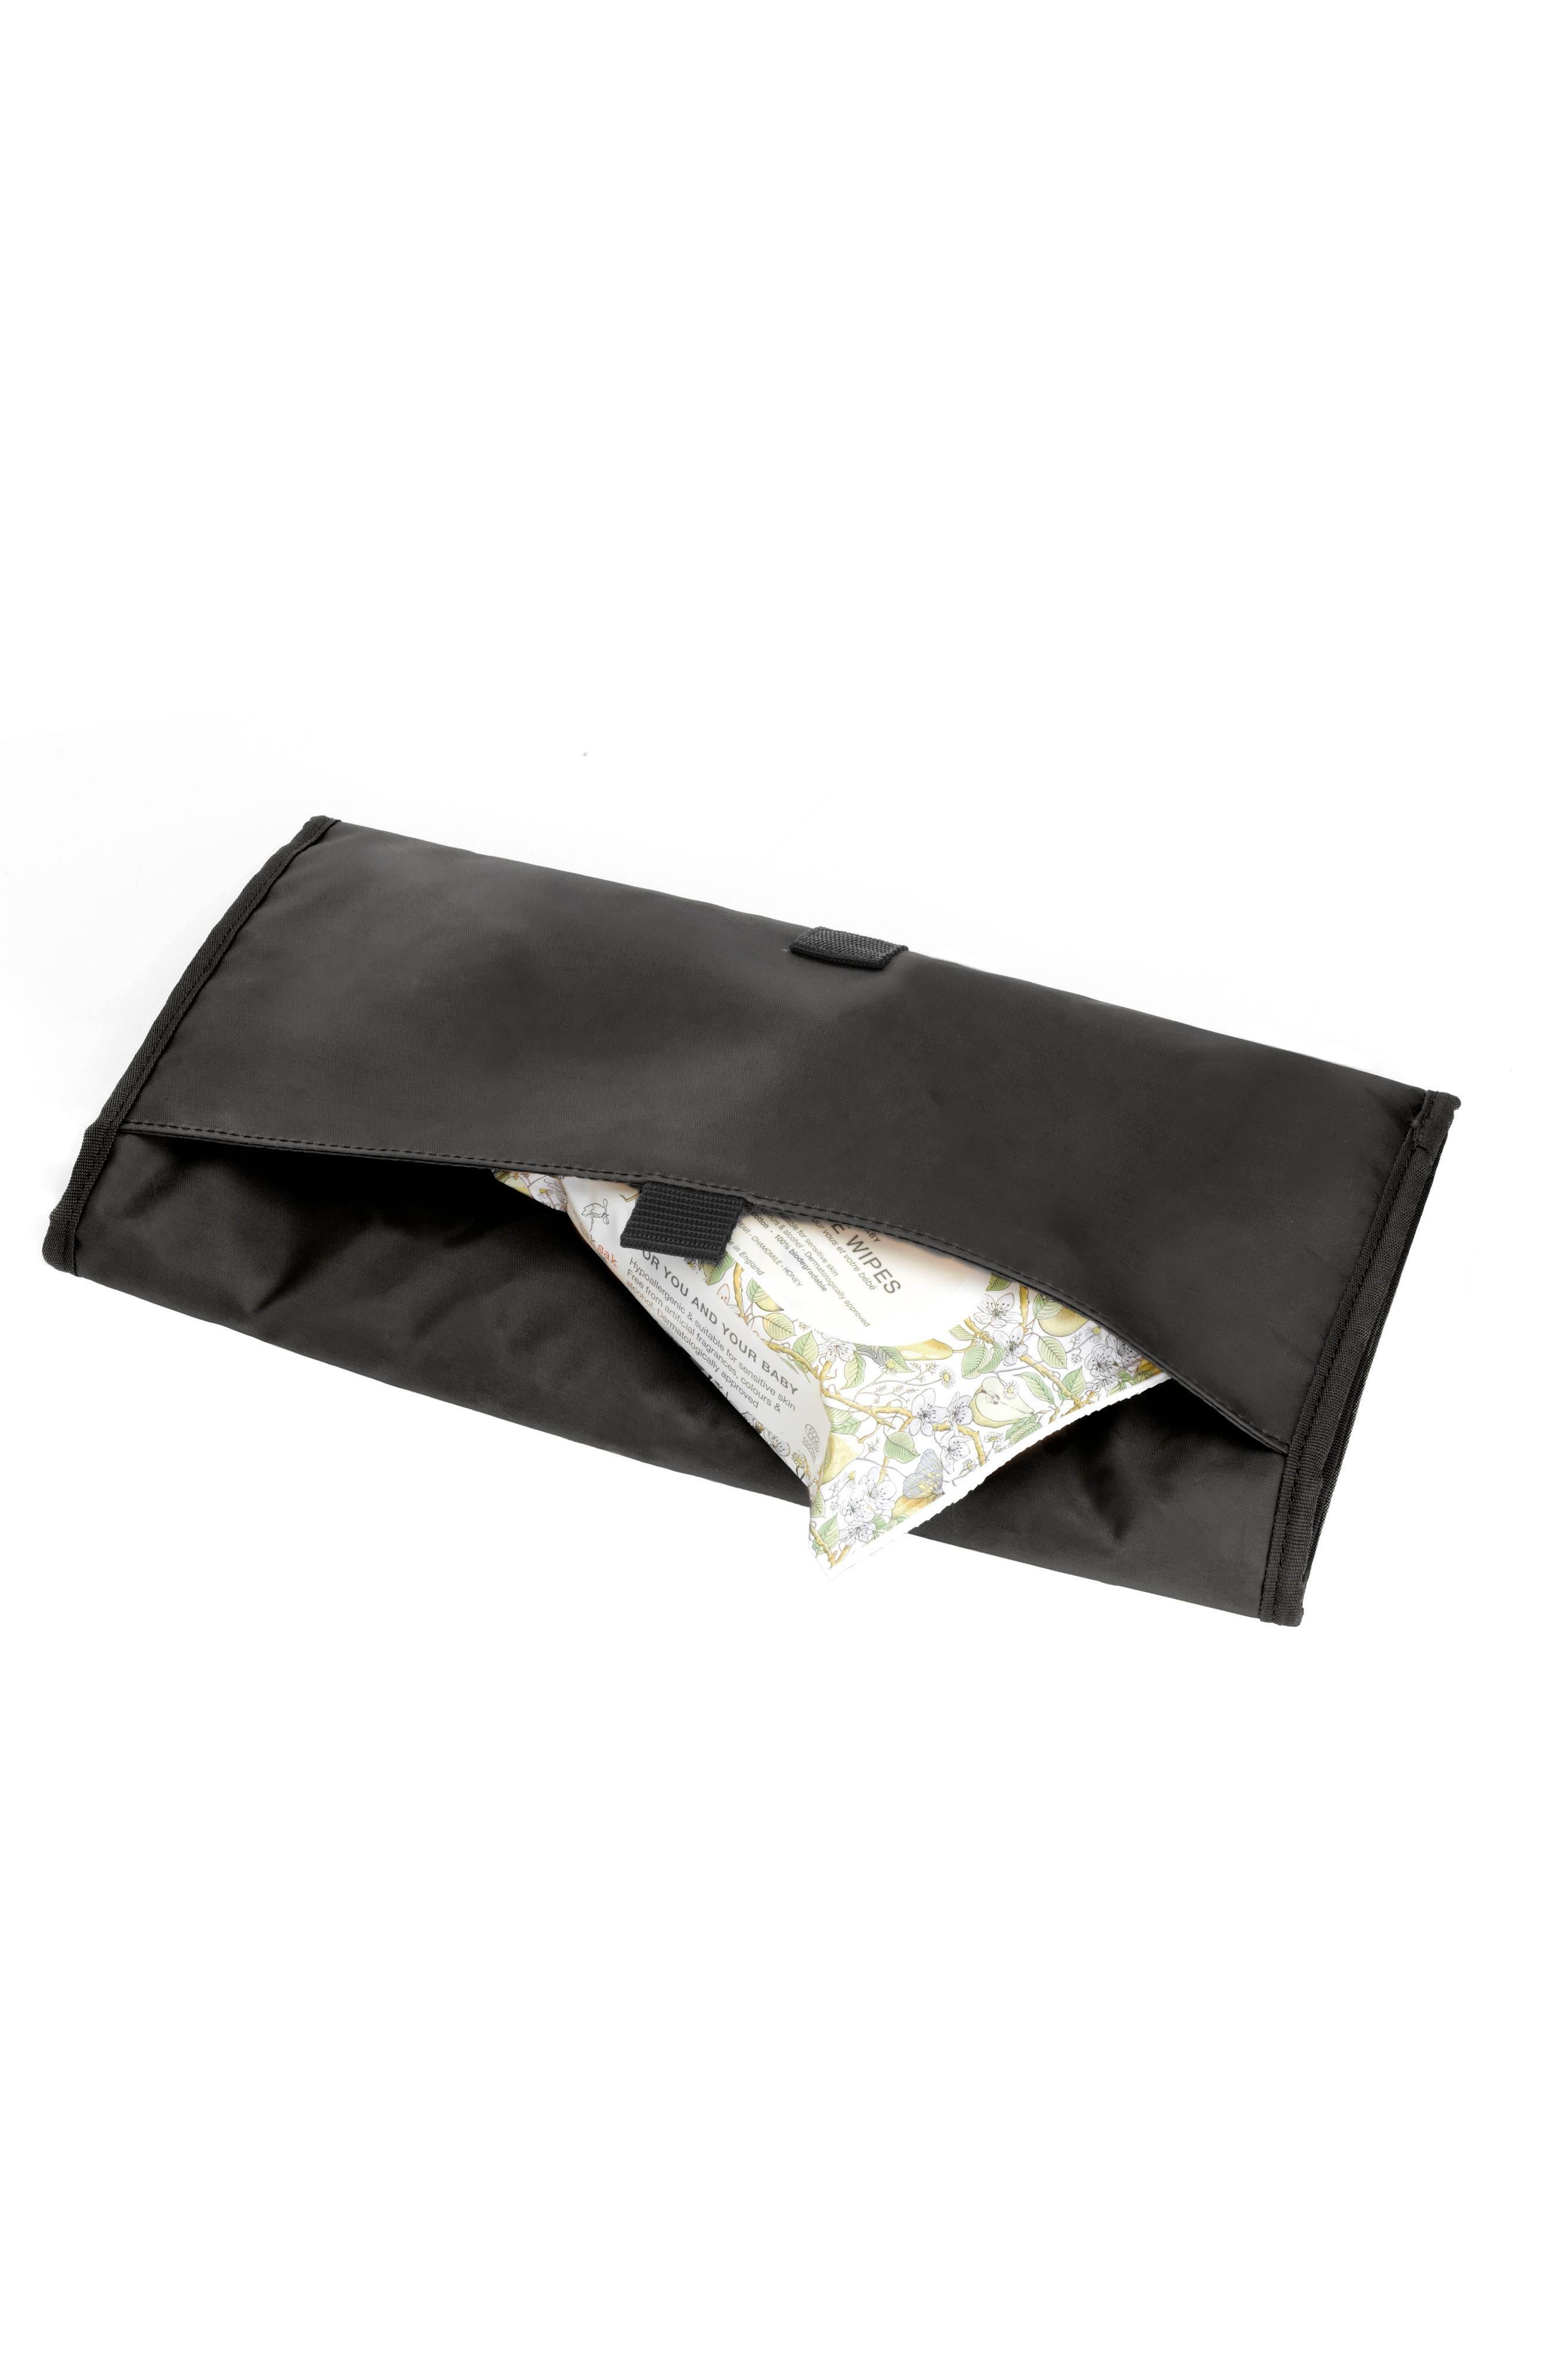 Alternate Image 3  - Storksak 'Sandy' Diaper Bag